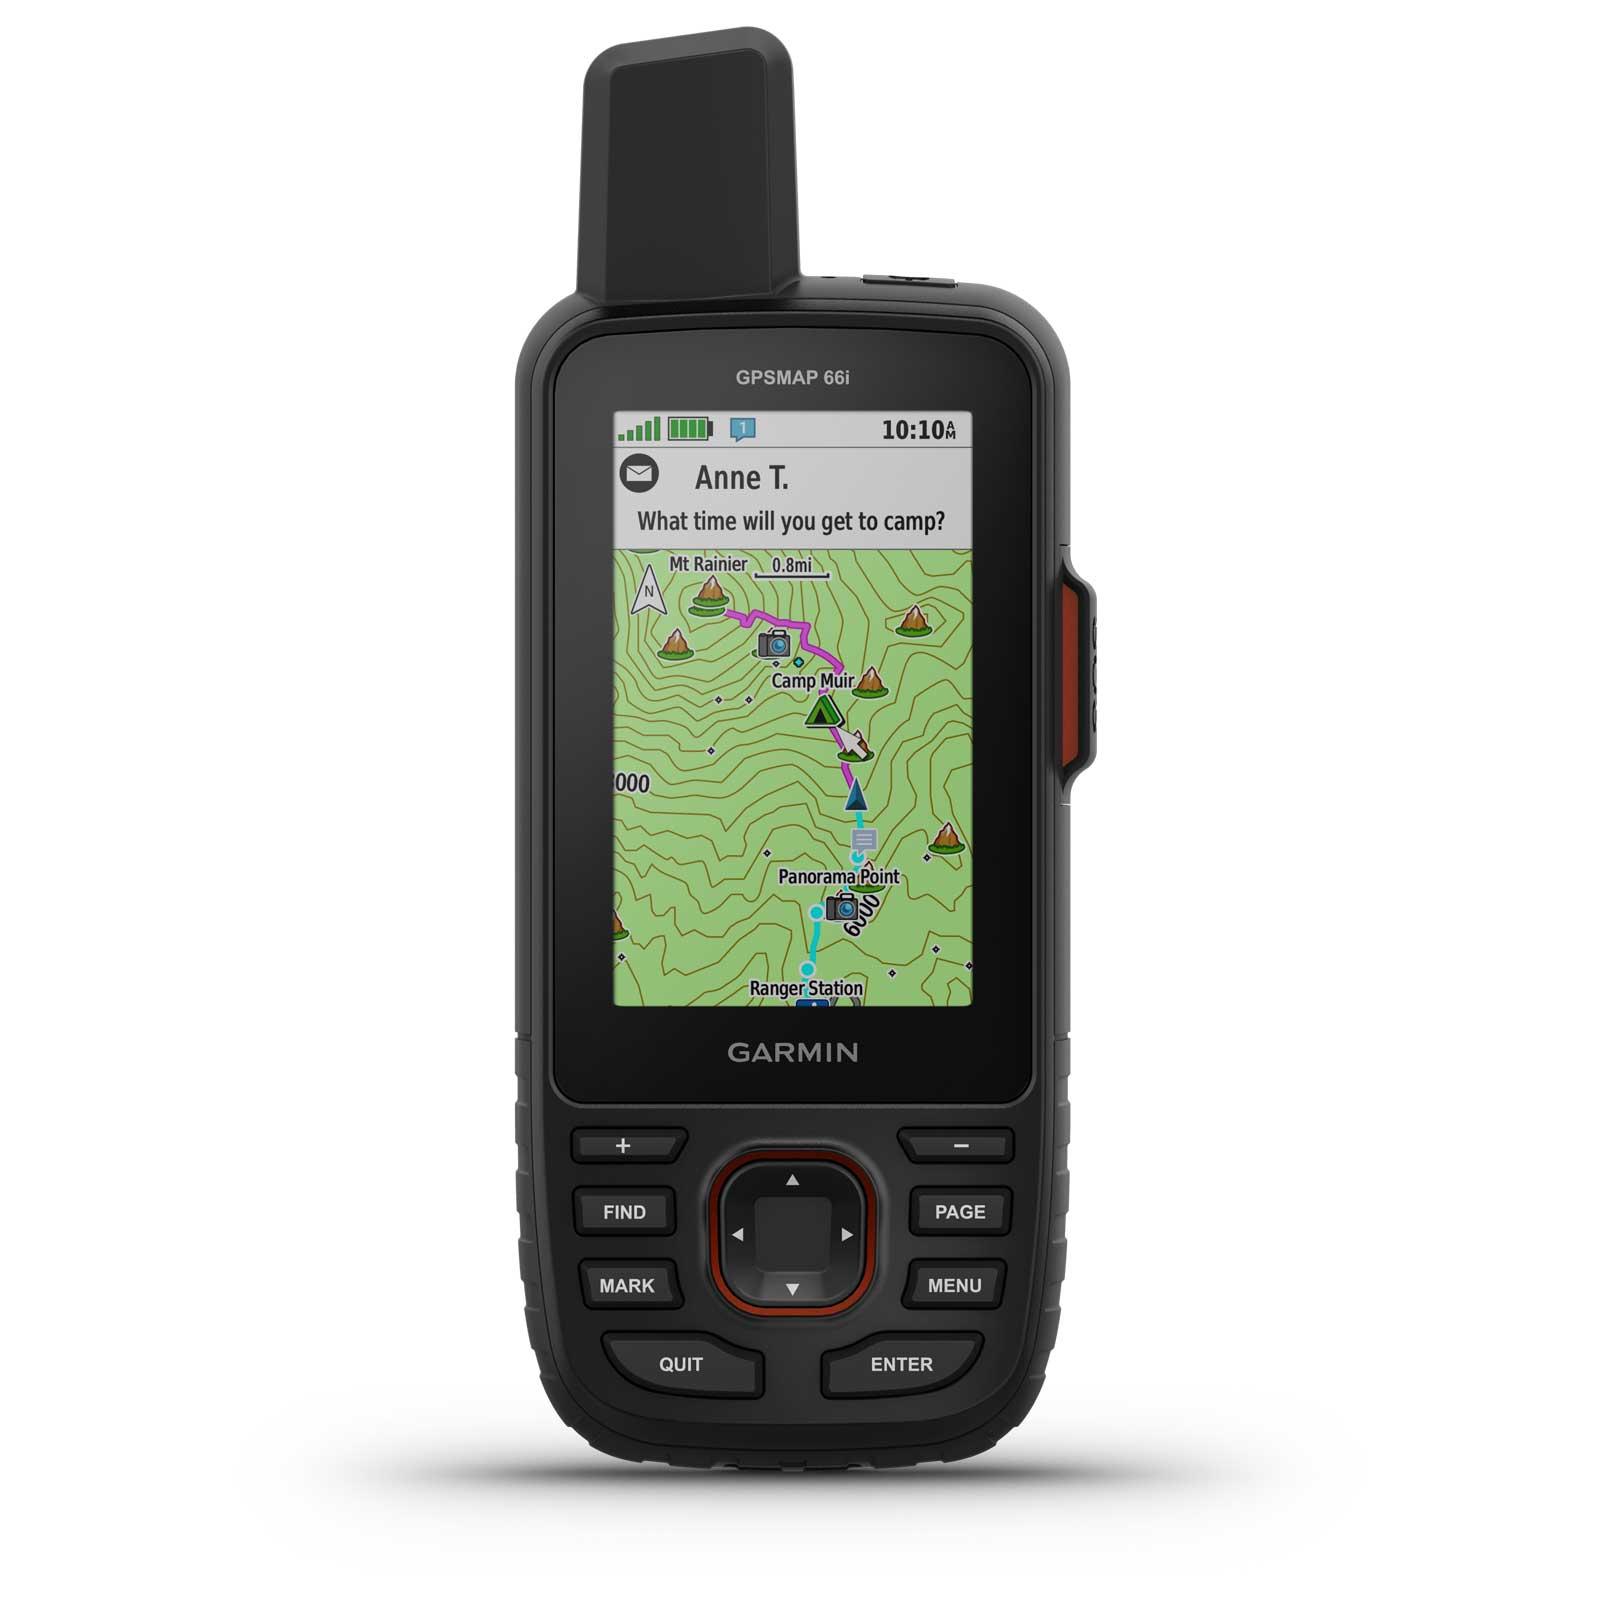 Garmin GPSMAP 66i Hand-Navigationsgerät + TopoActive Europa-Karte